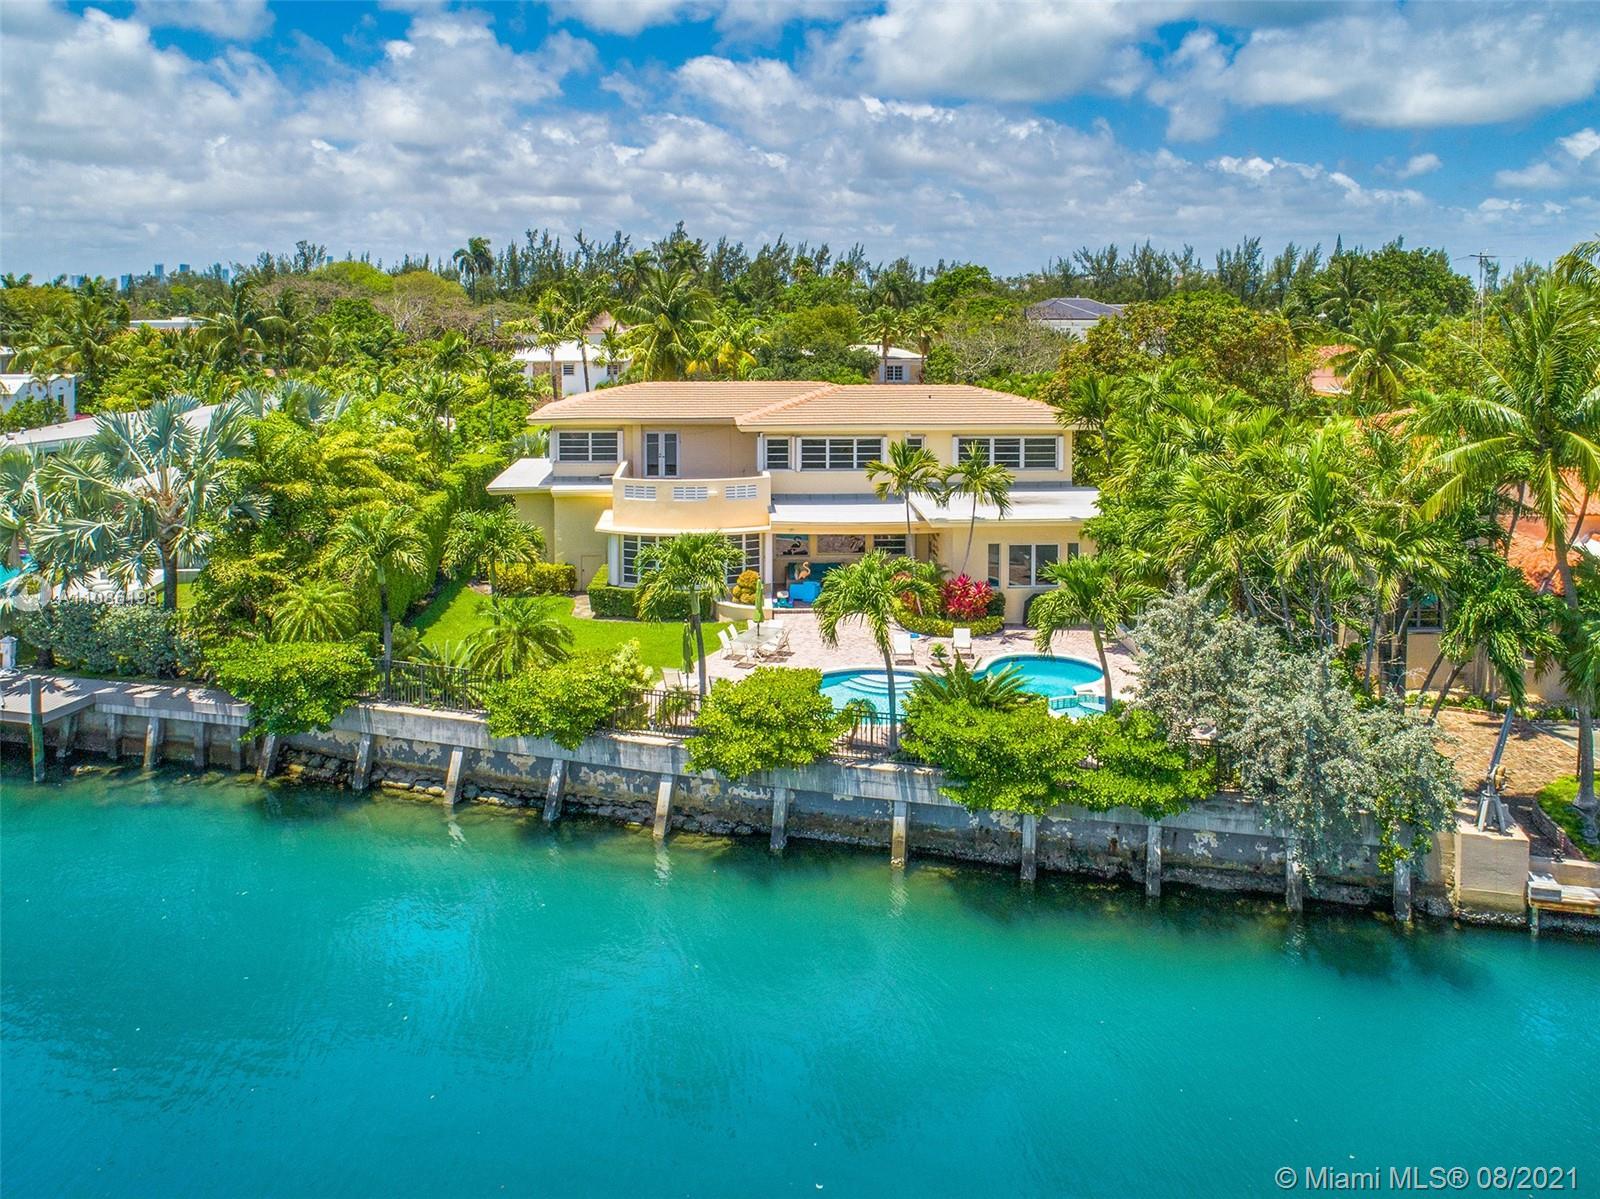 2995 Flamingo Dr, Miami Beach, Florida 33140